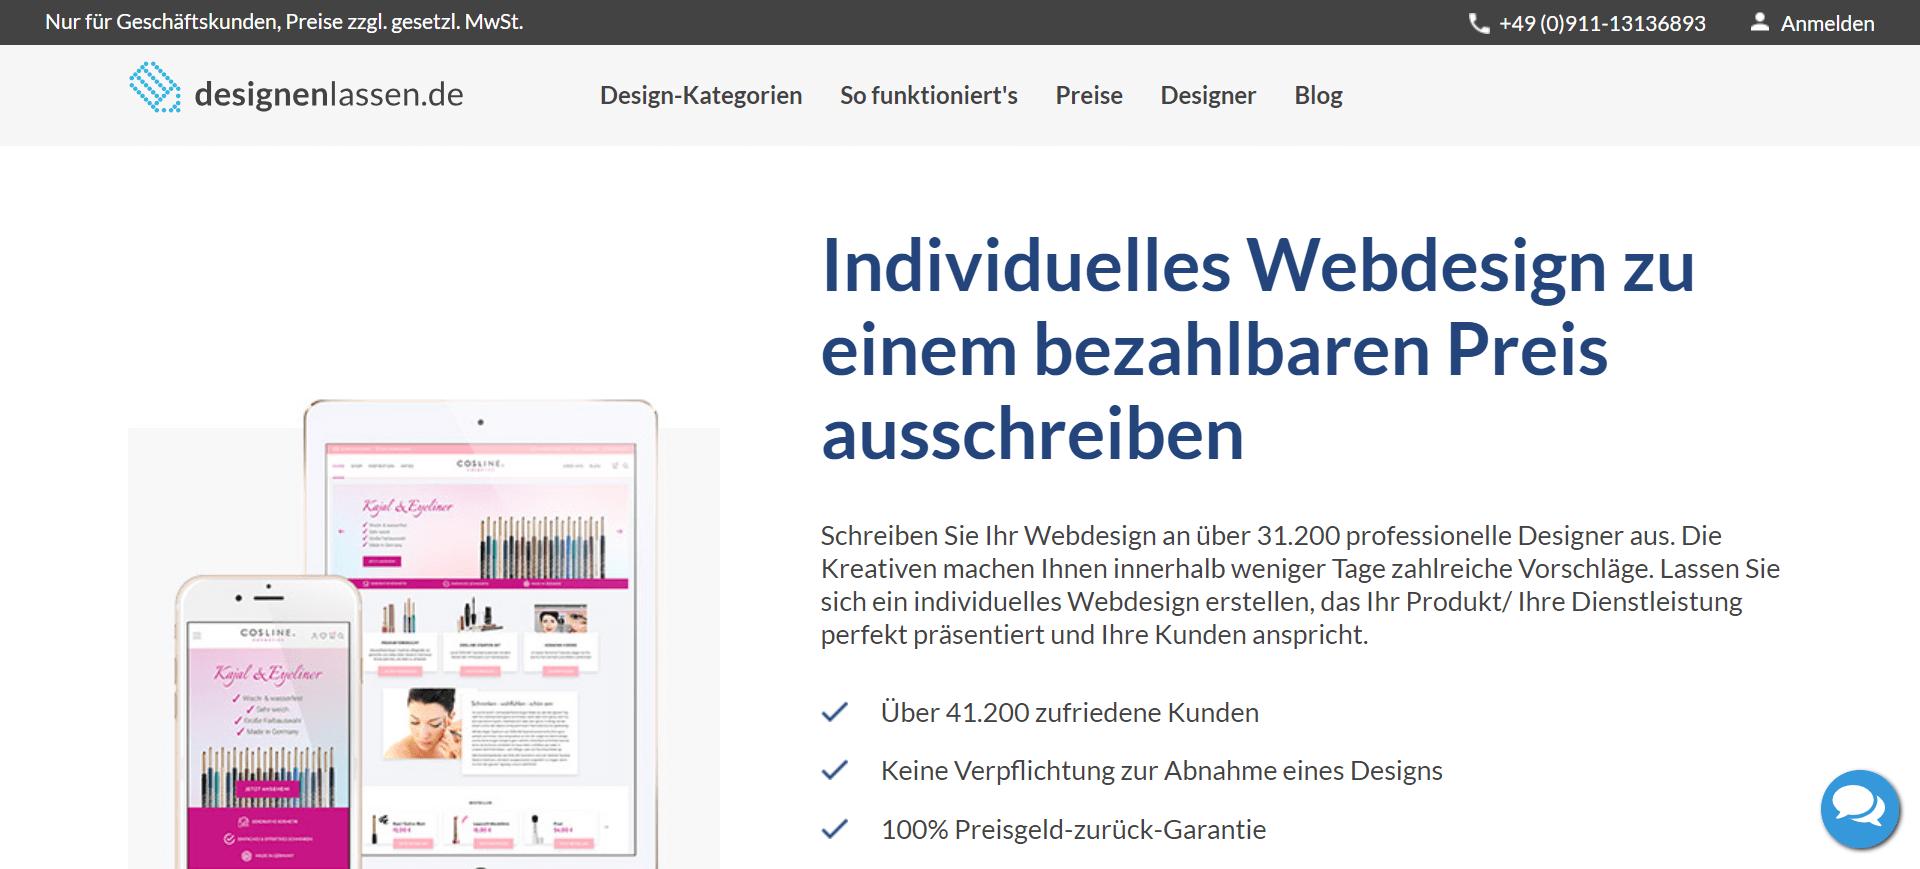 Designenlassen.de Webdesign